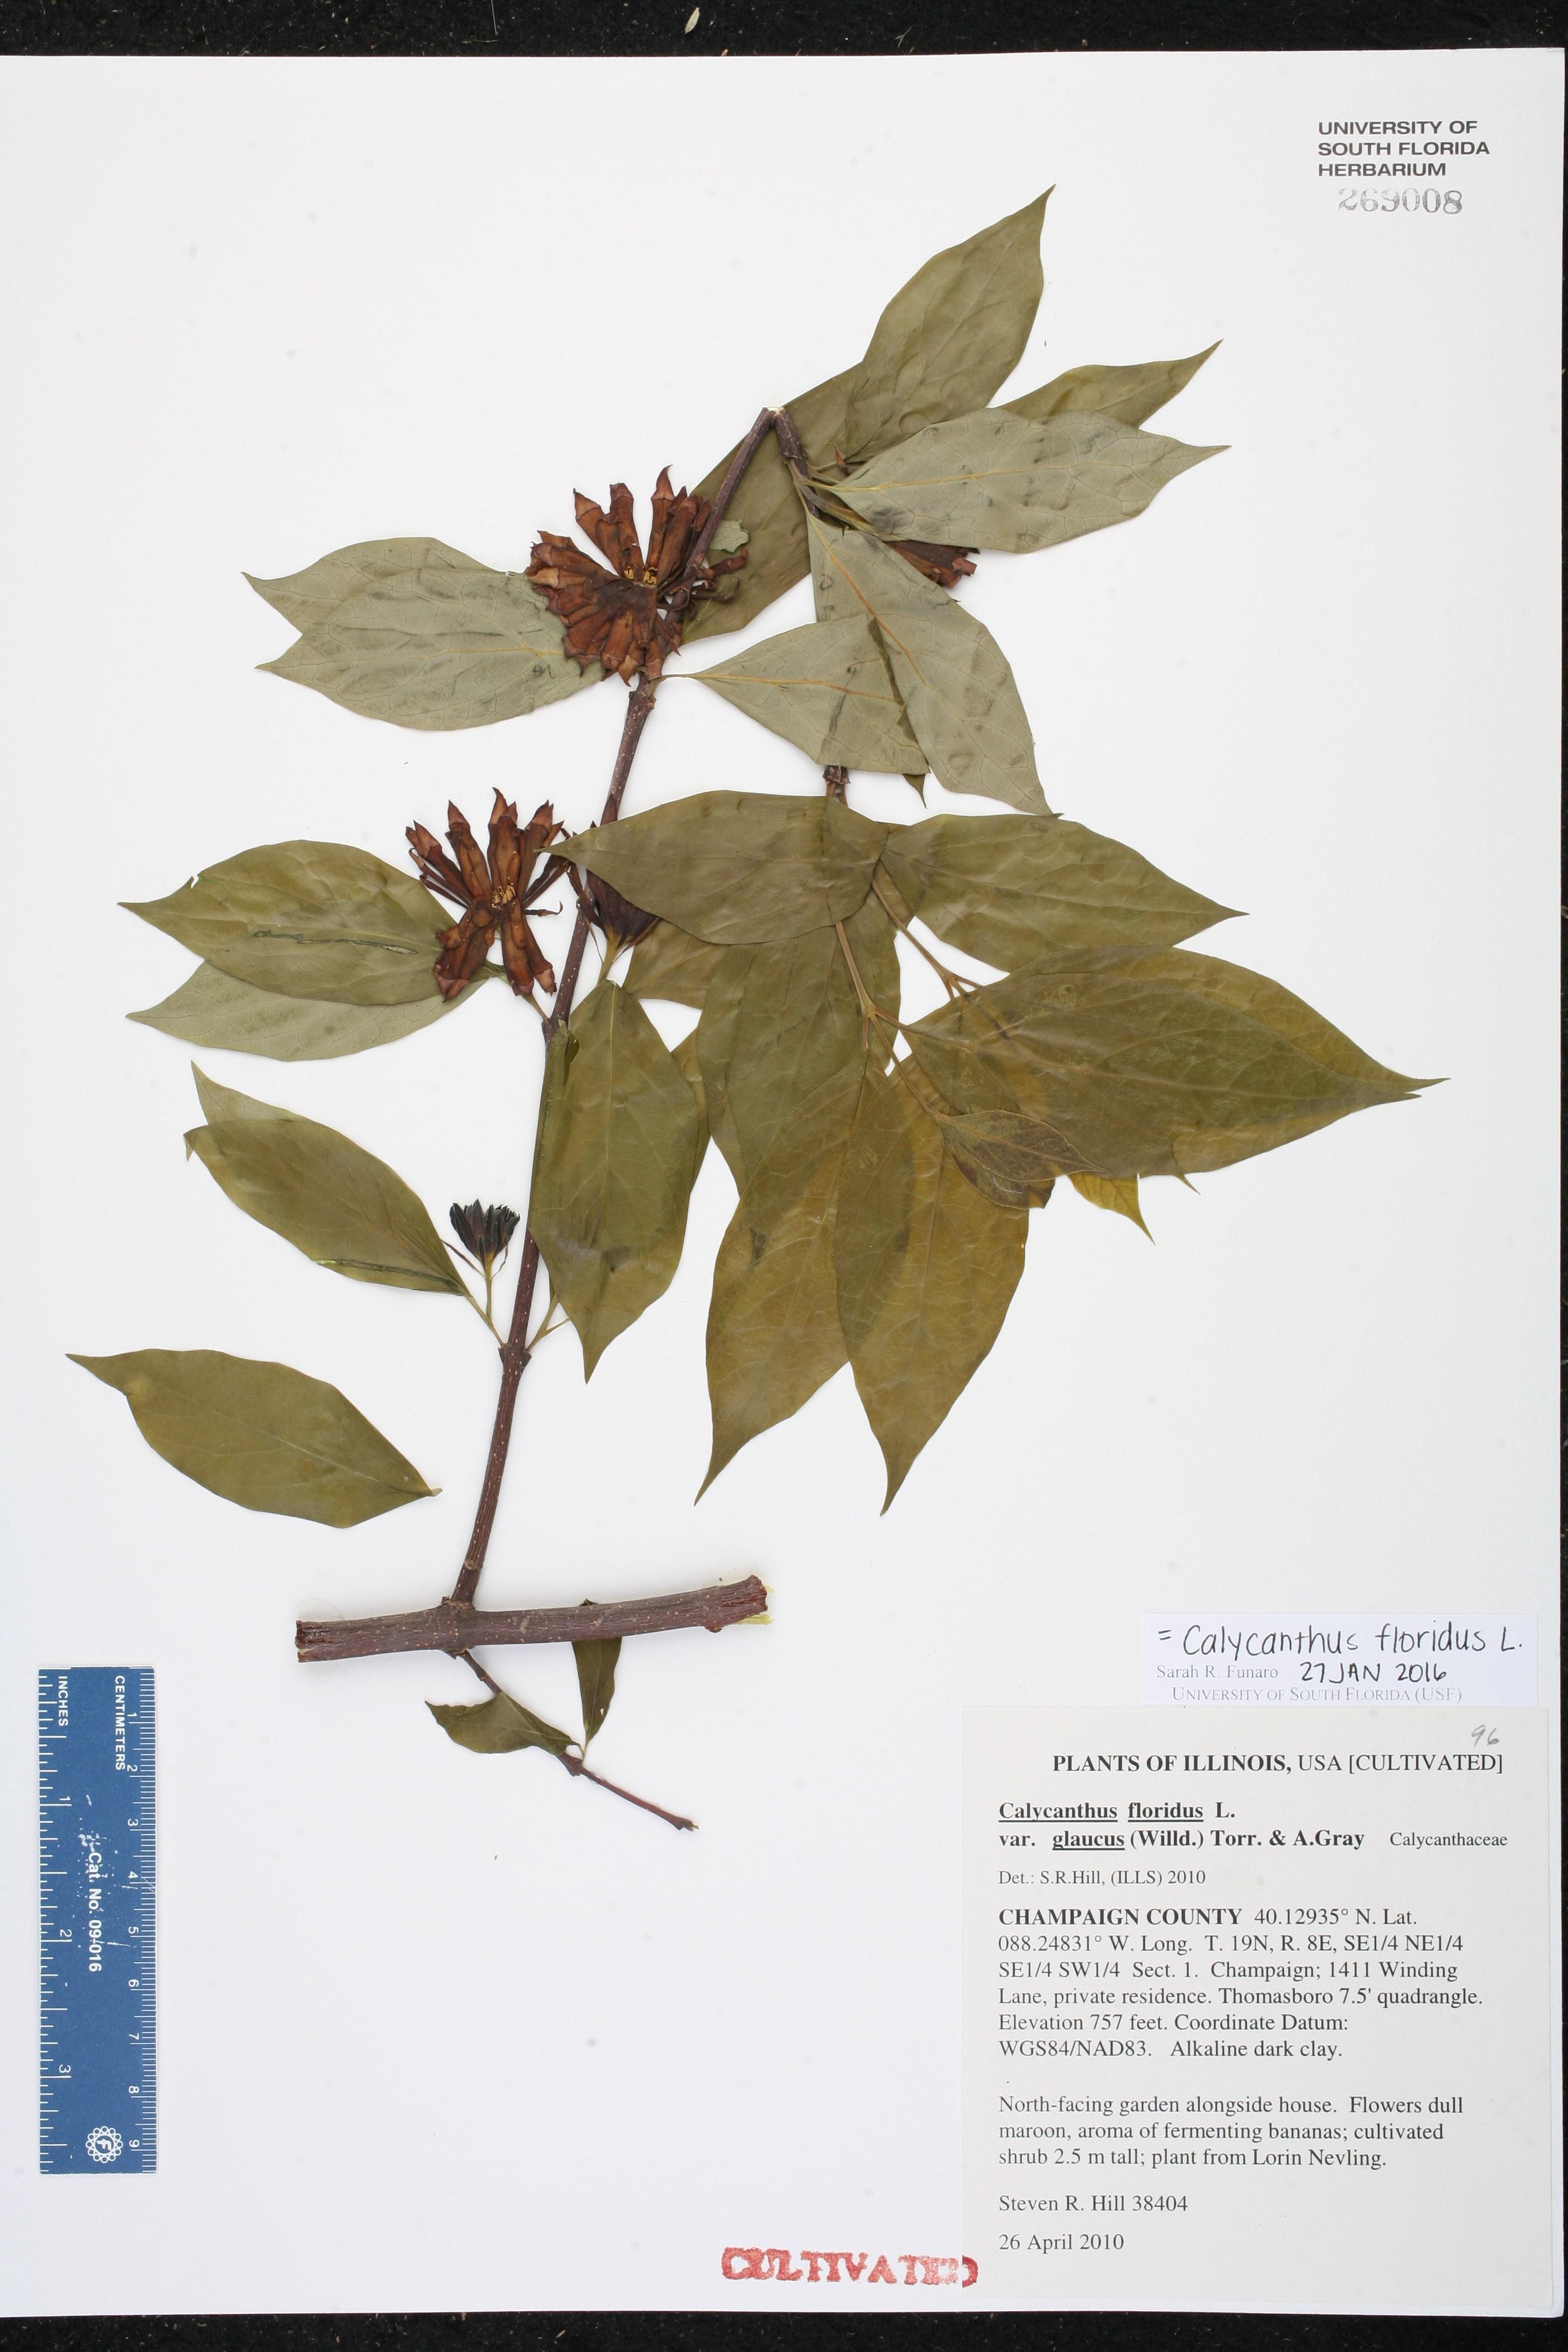 Illinois champaign county thomasboro - Family Name Calycanthaceae